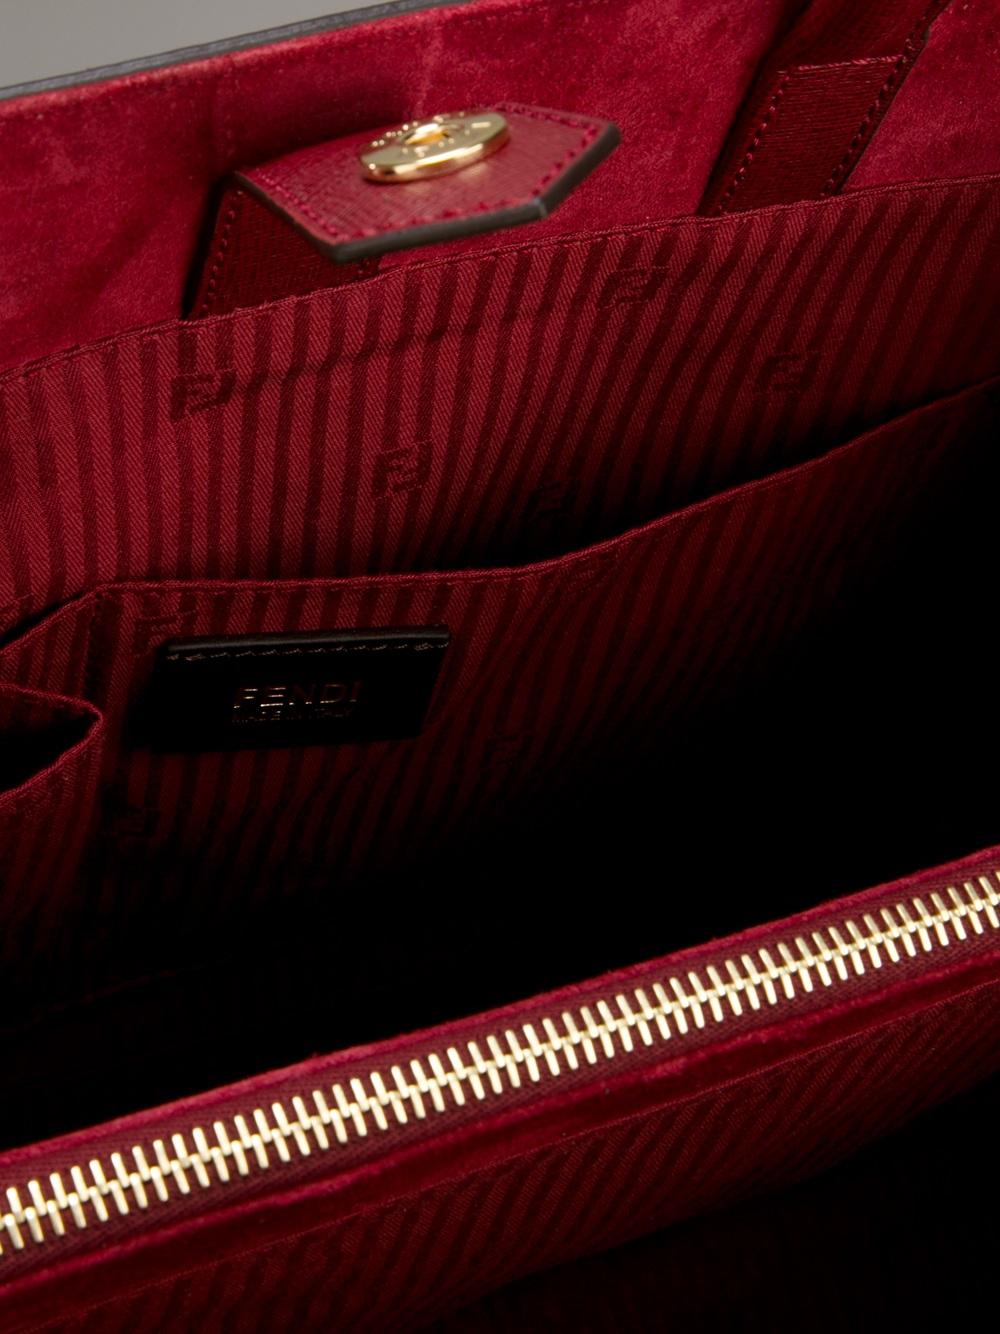 Fendi 2jour Tote in Red (Purple)